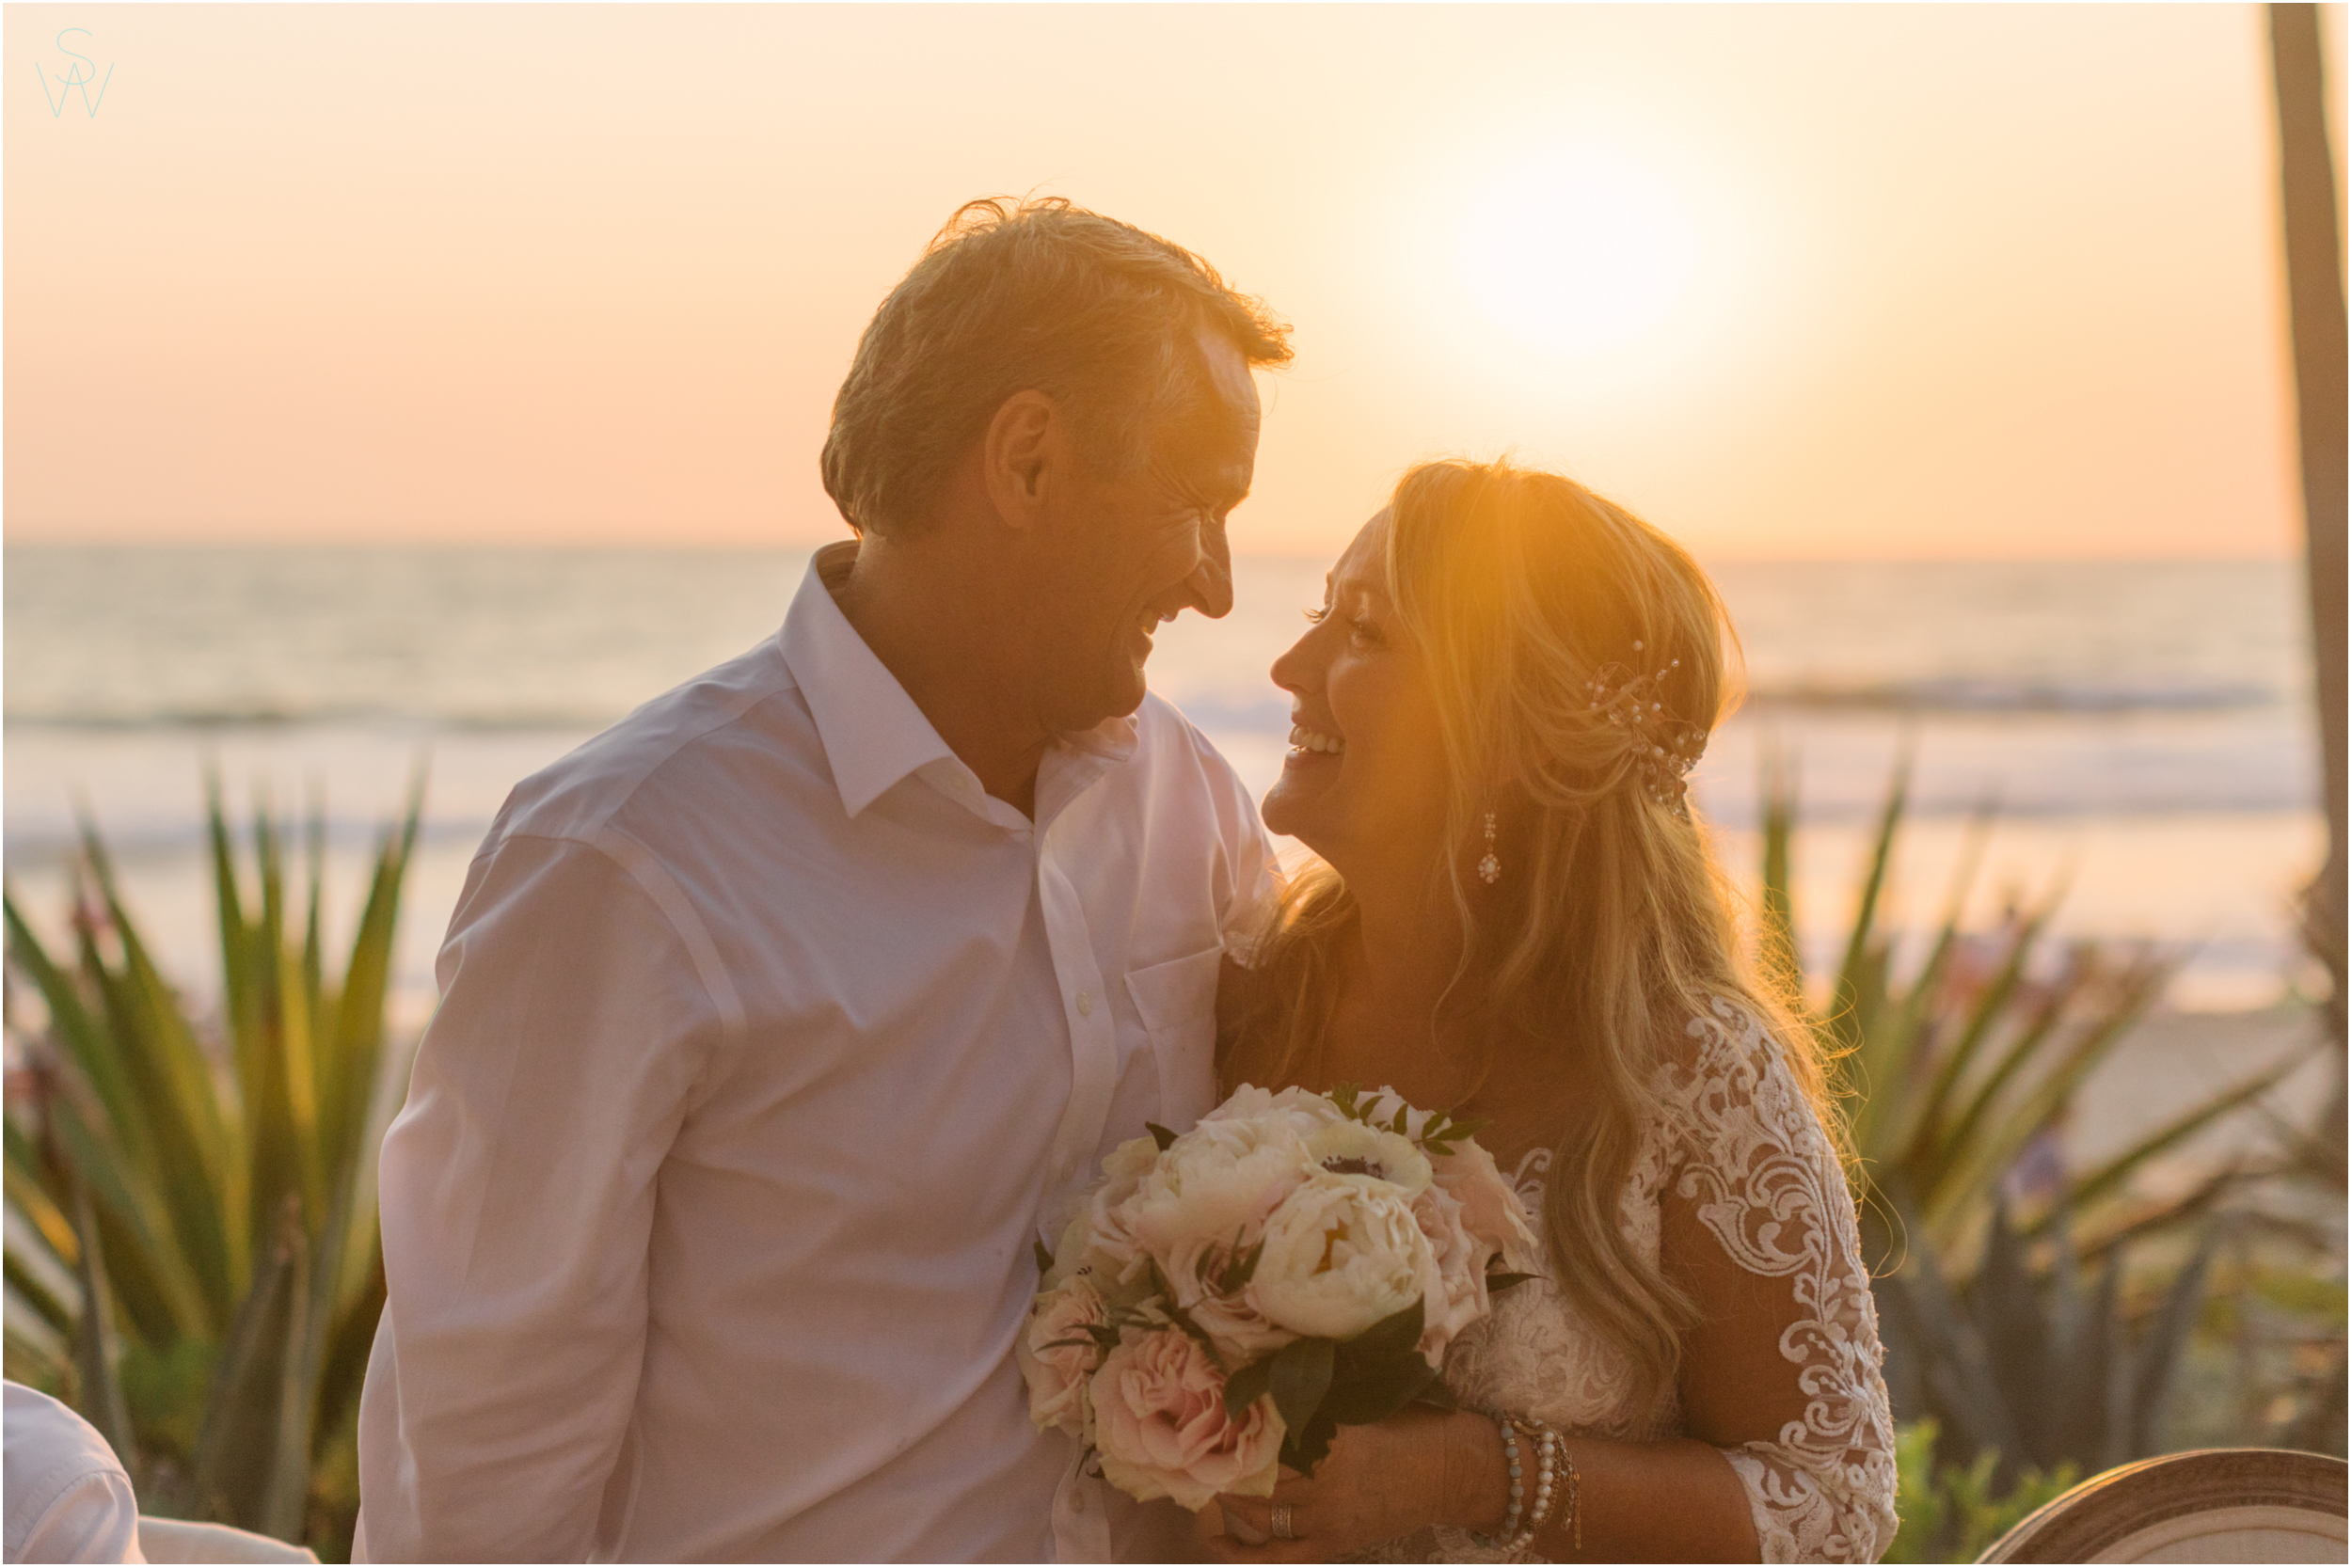 155DEL.MAR.WEDDINGS.romanticsphotography.shewanders.JPG